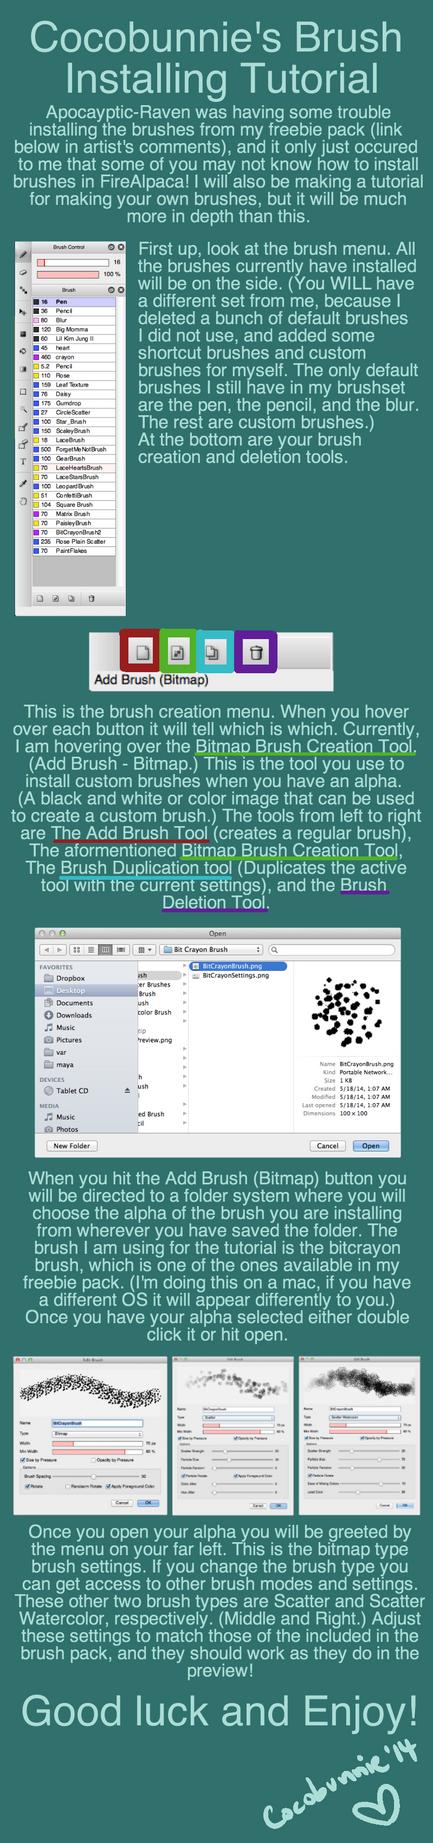 Tut: Brush Installing Tutorial by cocobunnie